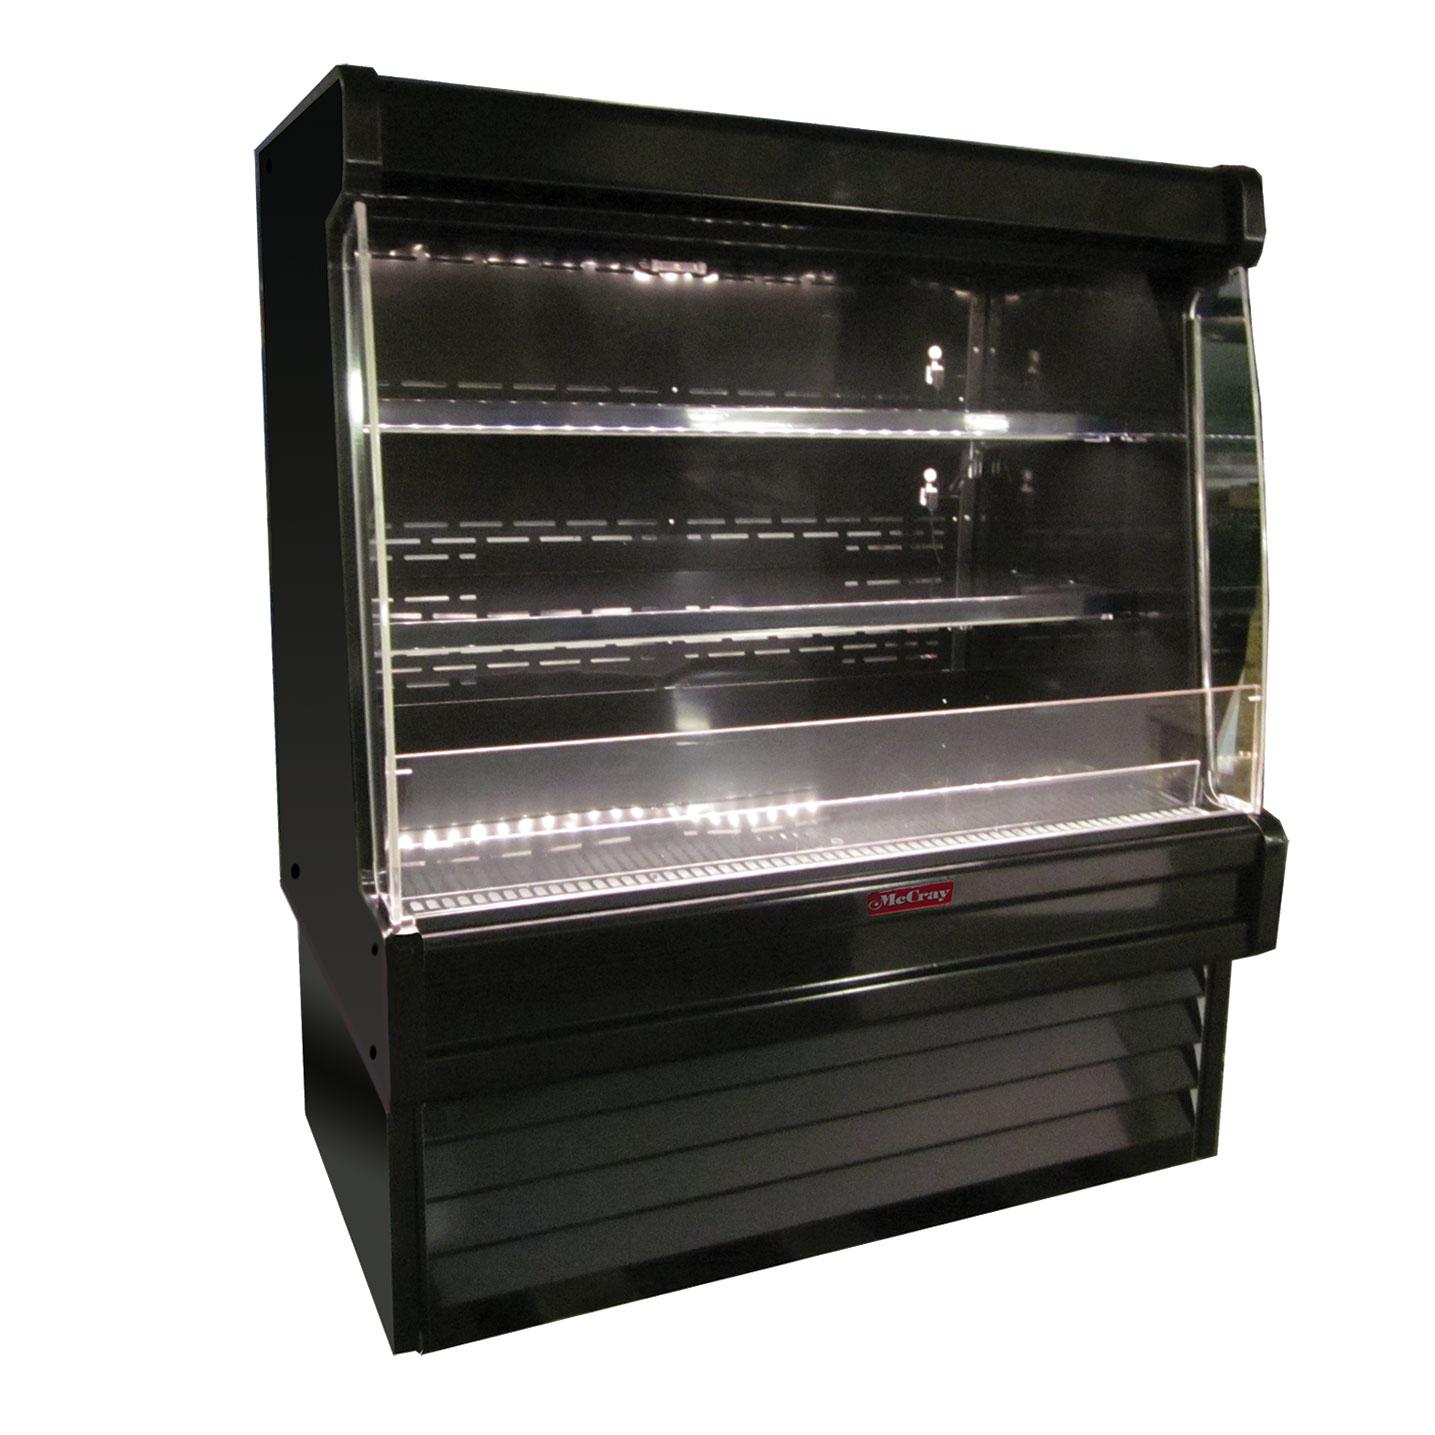 Howard-McCray SC-OP35E-5L-B-LED display case, produce